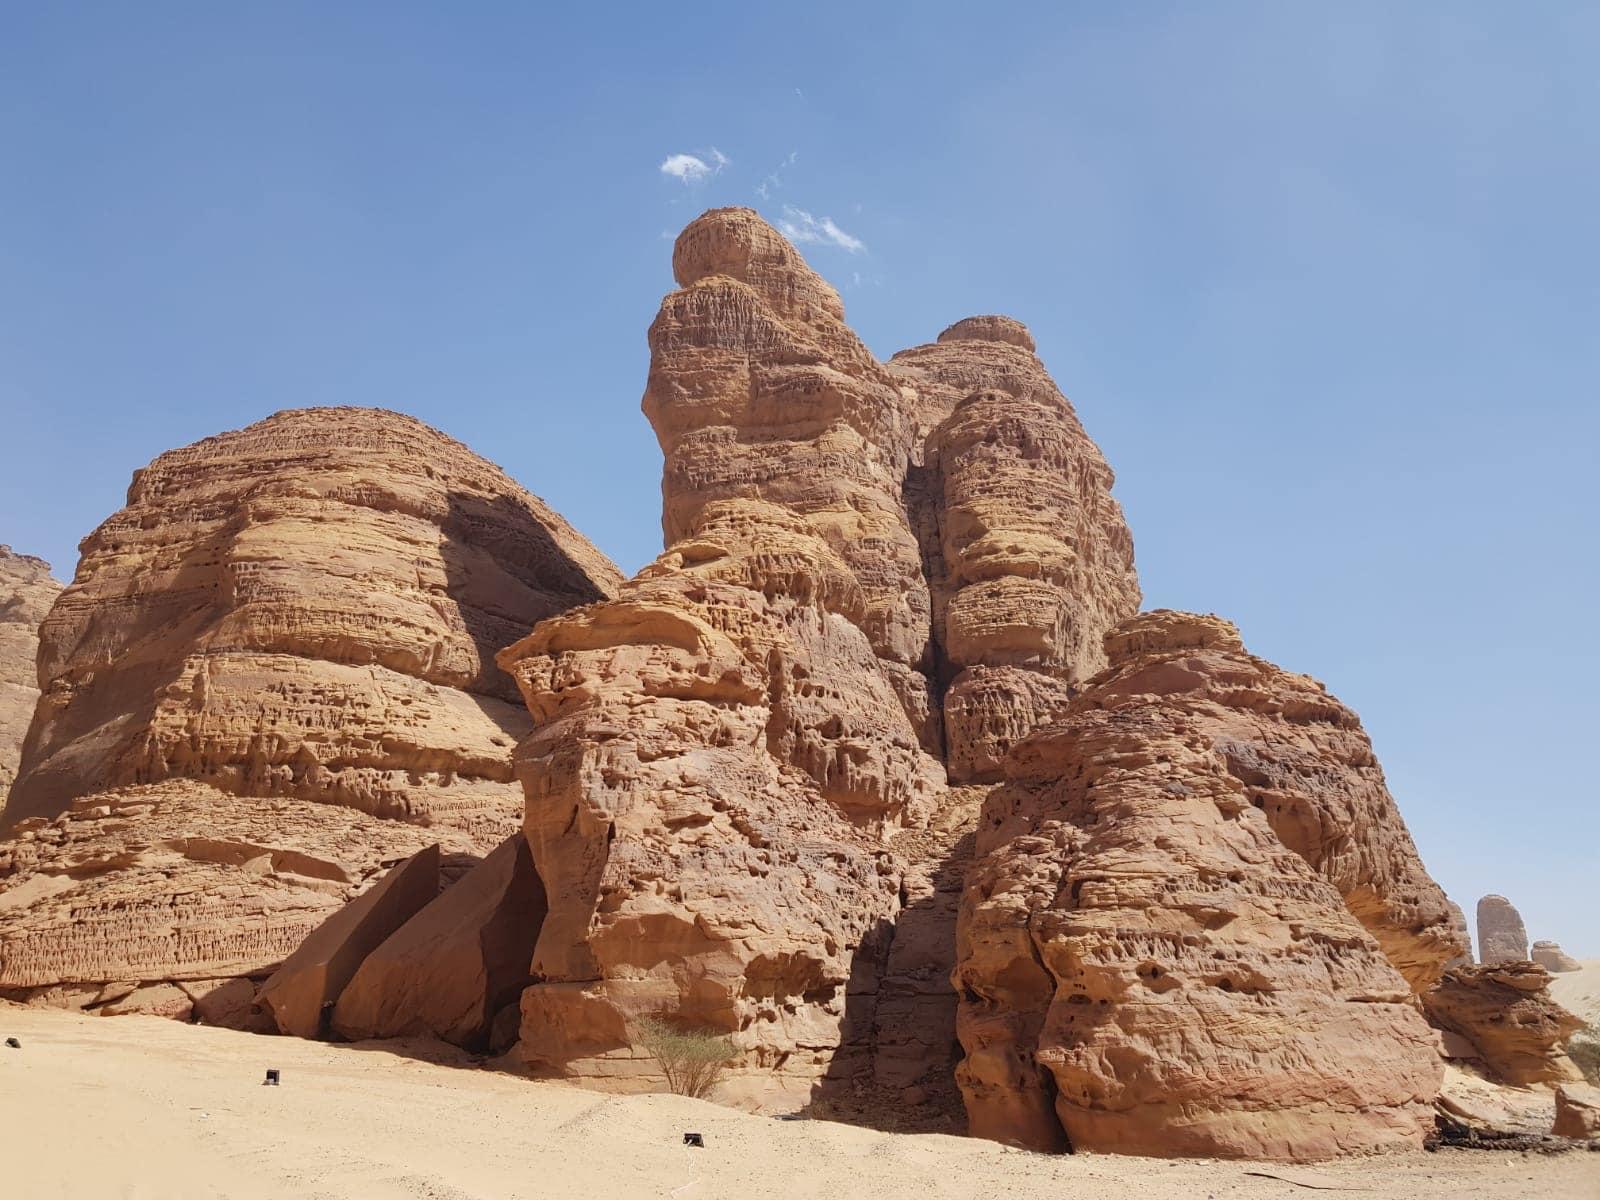 Felsen in Wüste Saudi Arabiens